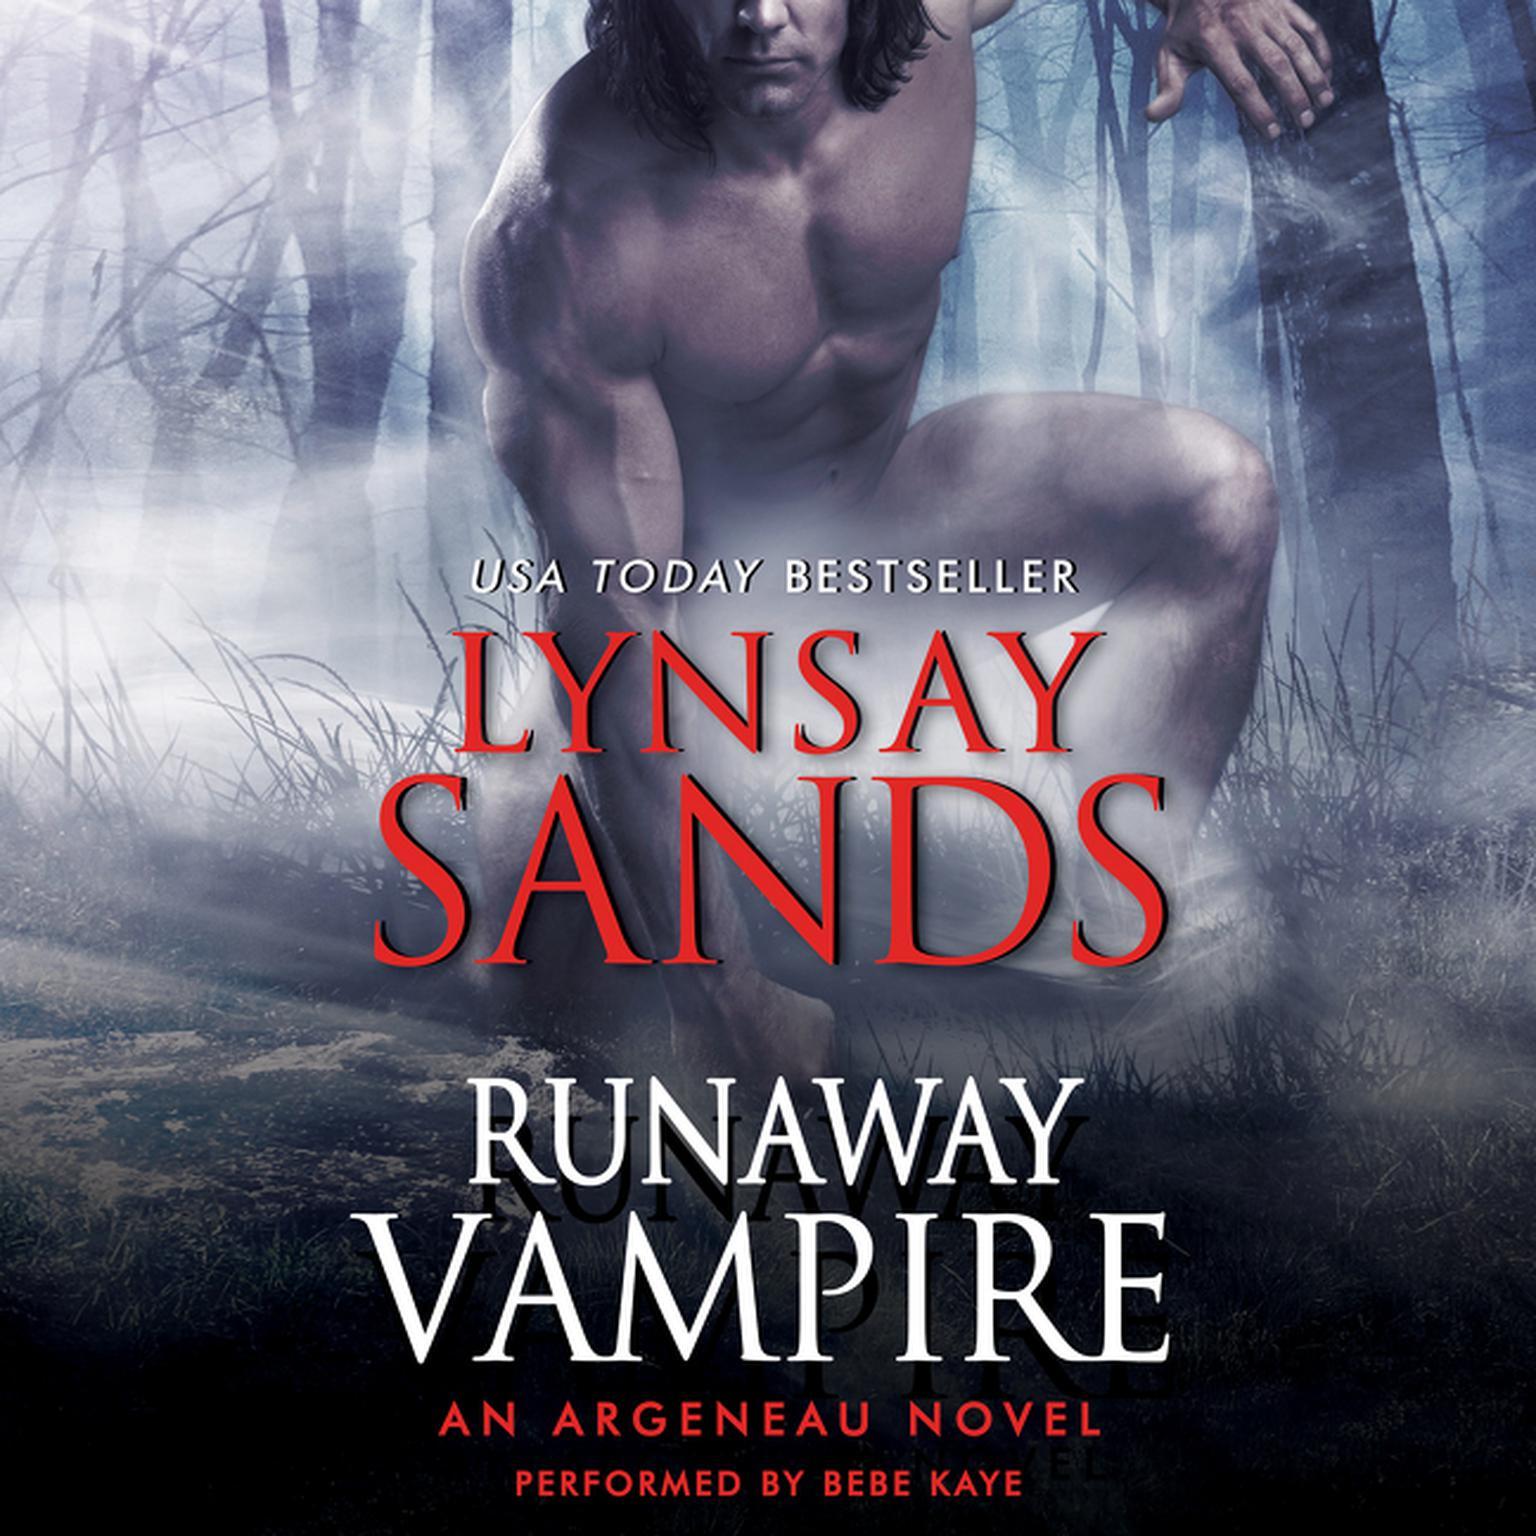 Runaway Vampire: An Argeneau Novel Audiobook, by Lynsay Sands